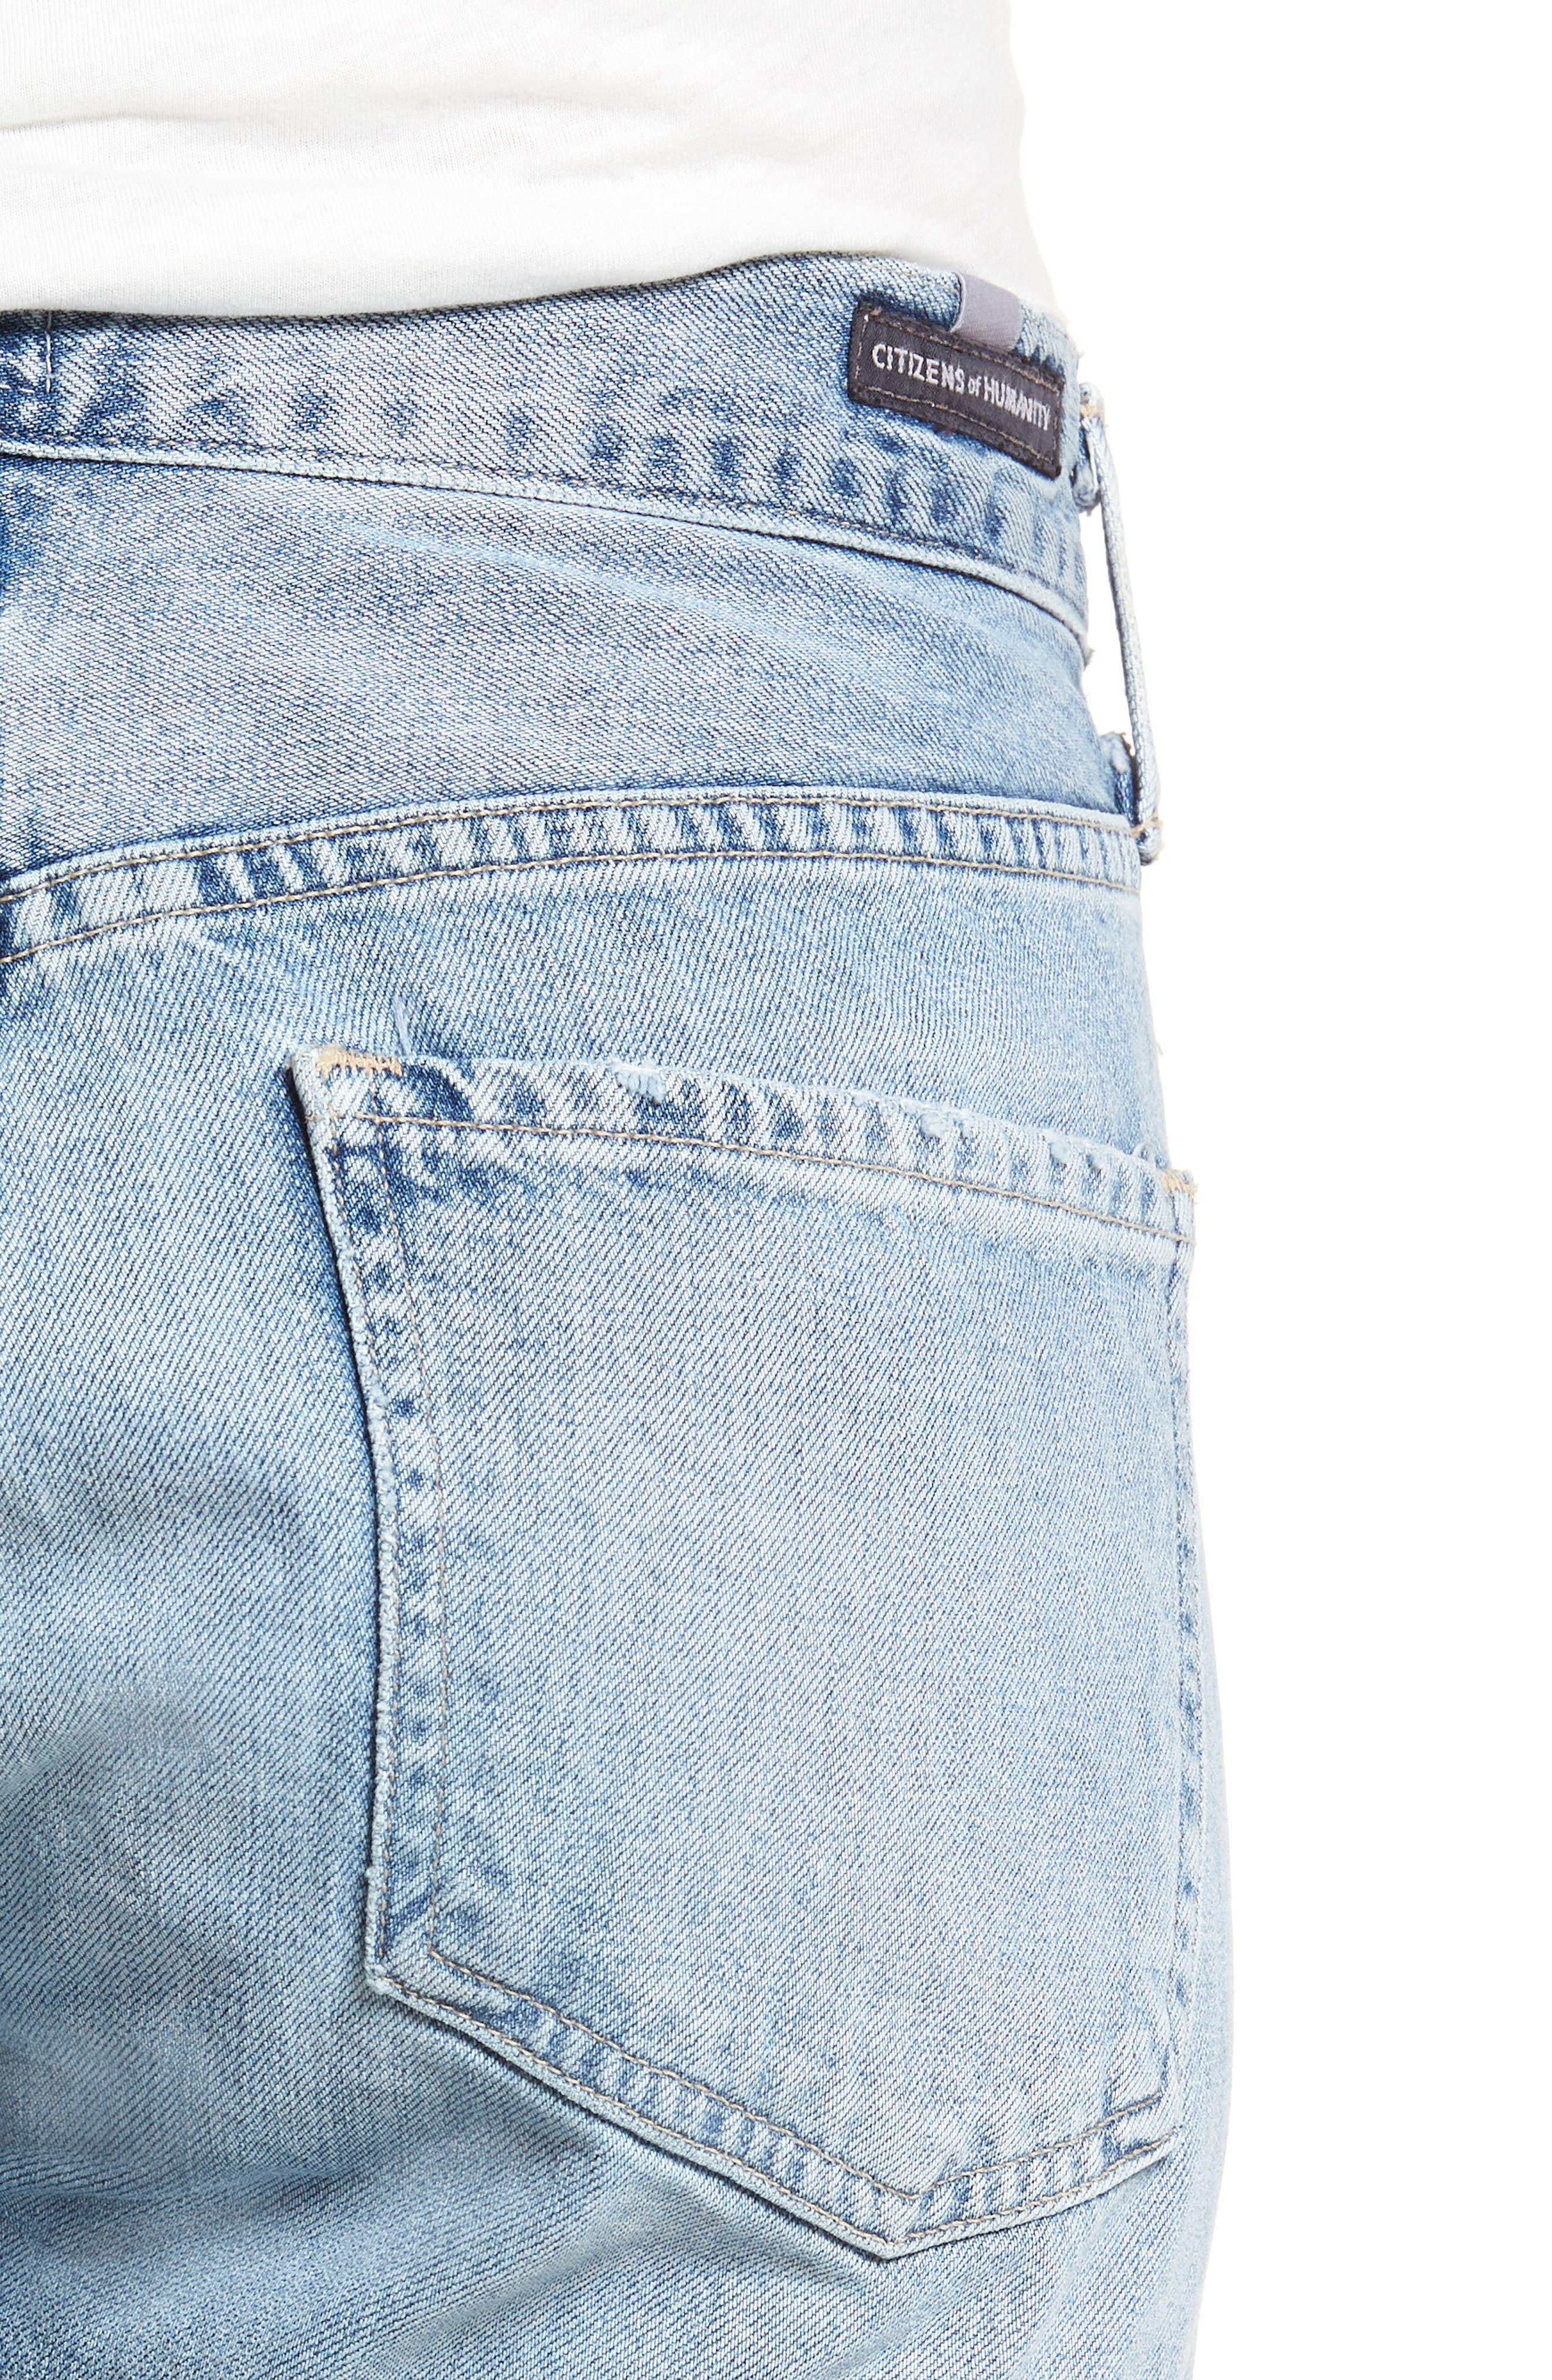 Emerson Slim Fit Boyfriend Jeans,                             Alternate thumbnail 4, color,                             SUNDAY MORNING